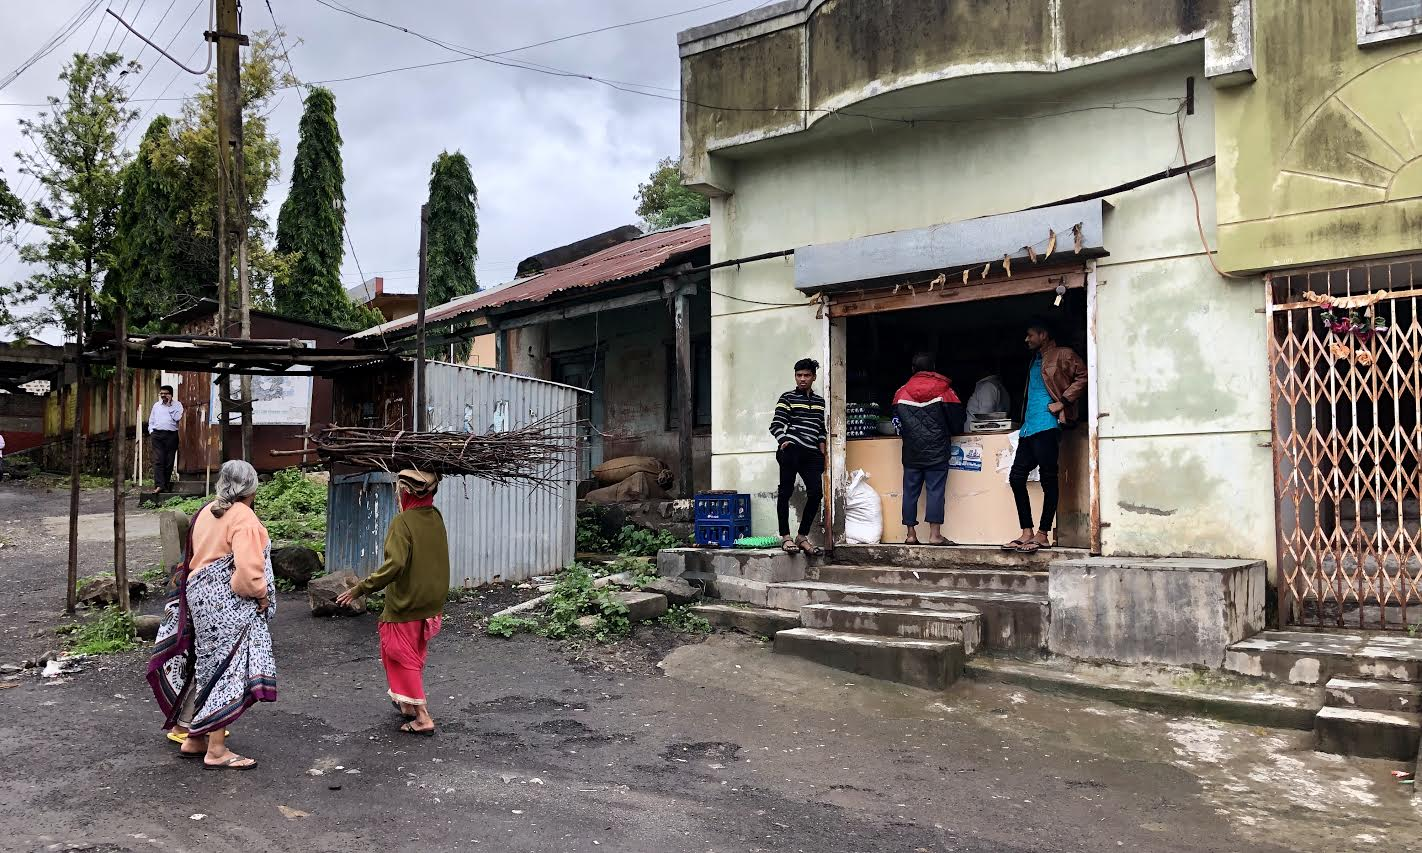 Gulumb street view